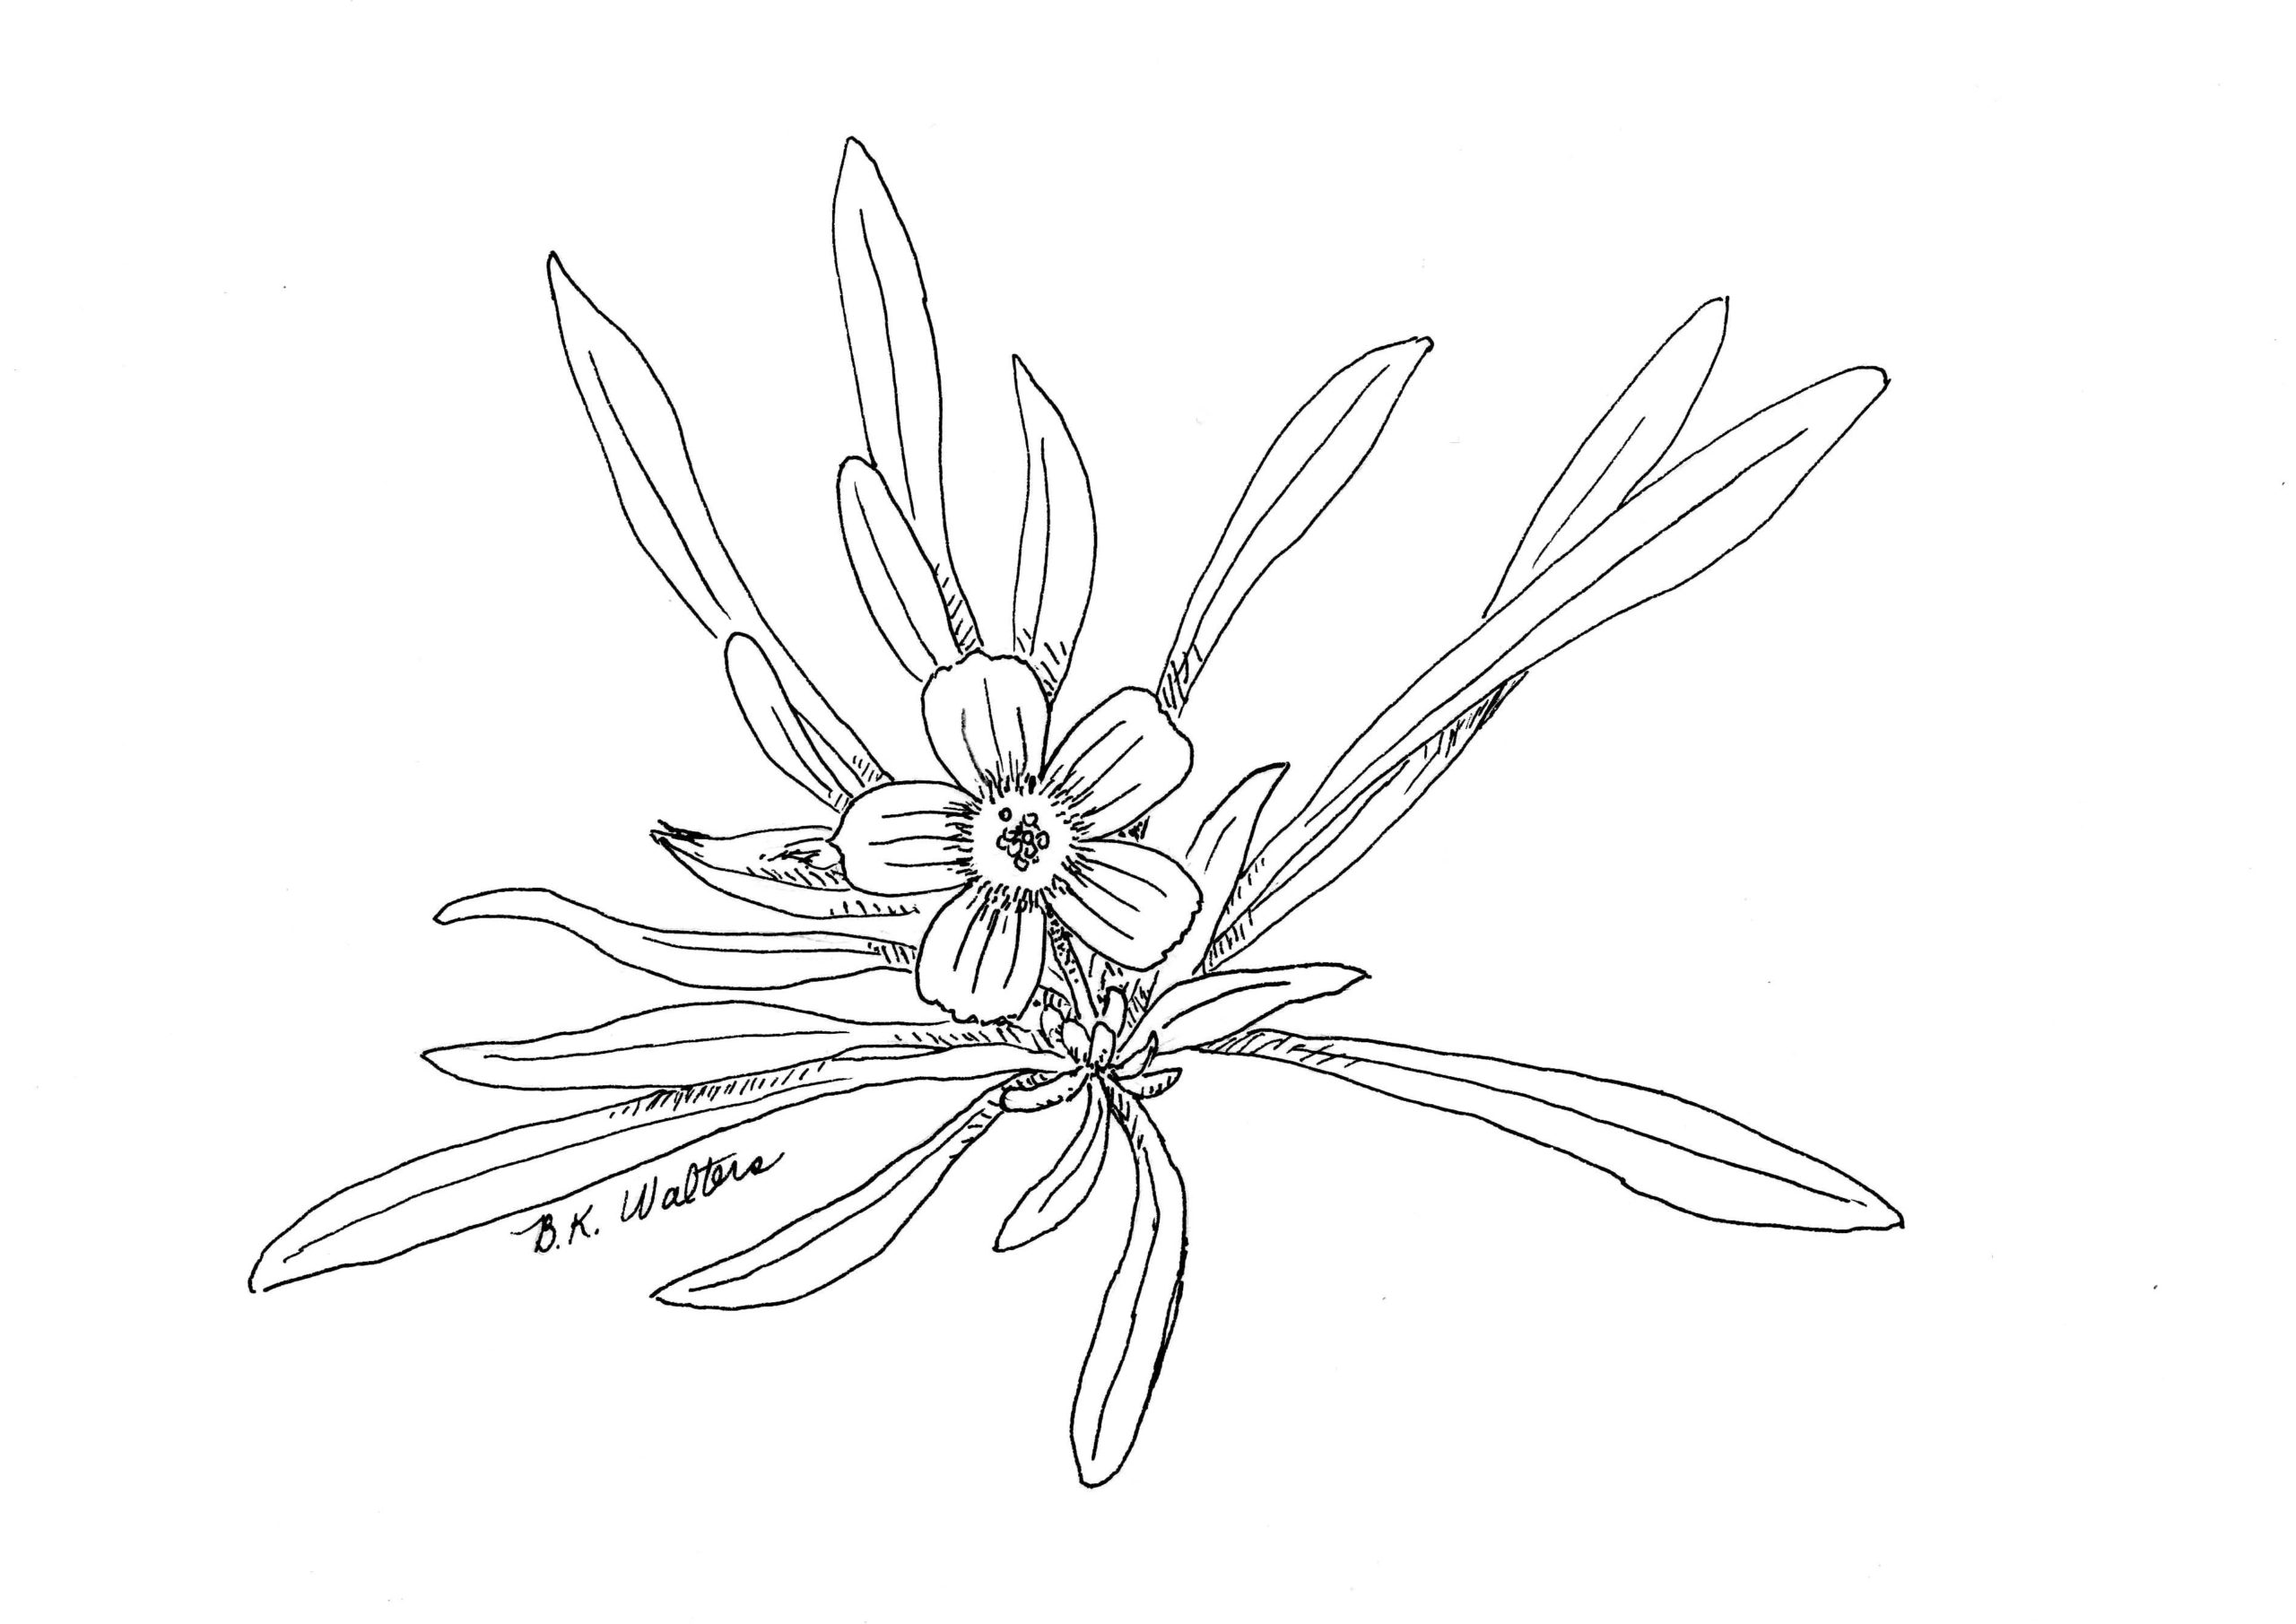 Calandrinia ciliata